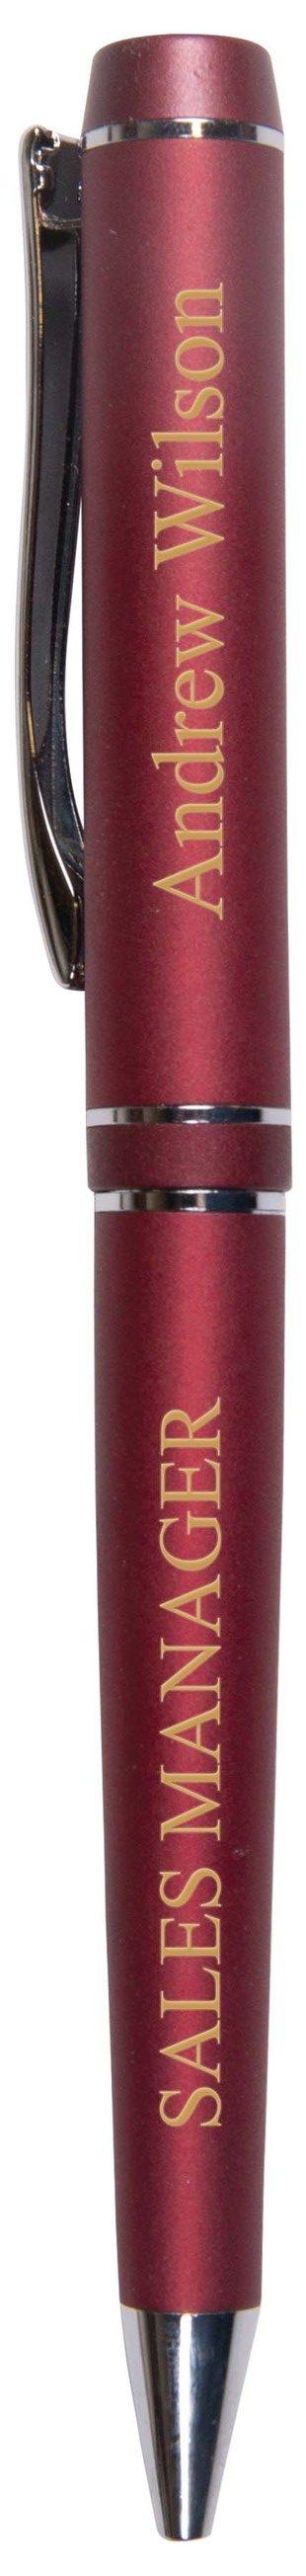 Metal Pen 5